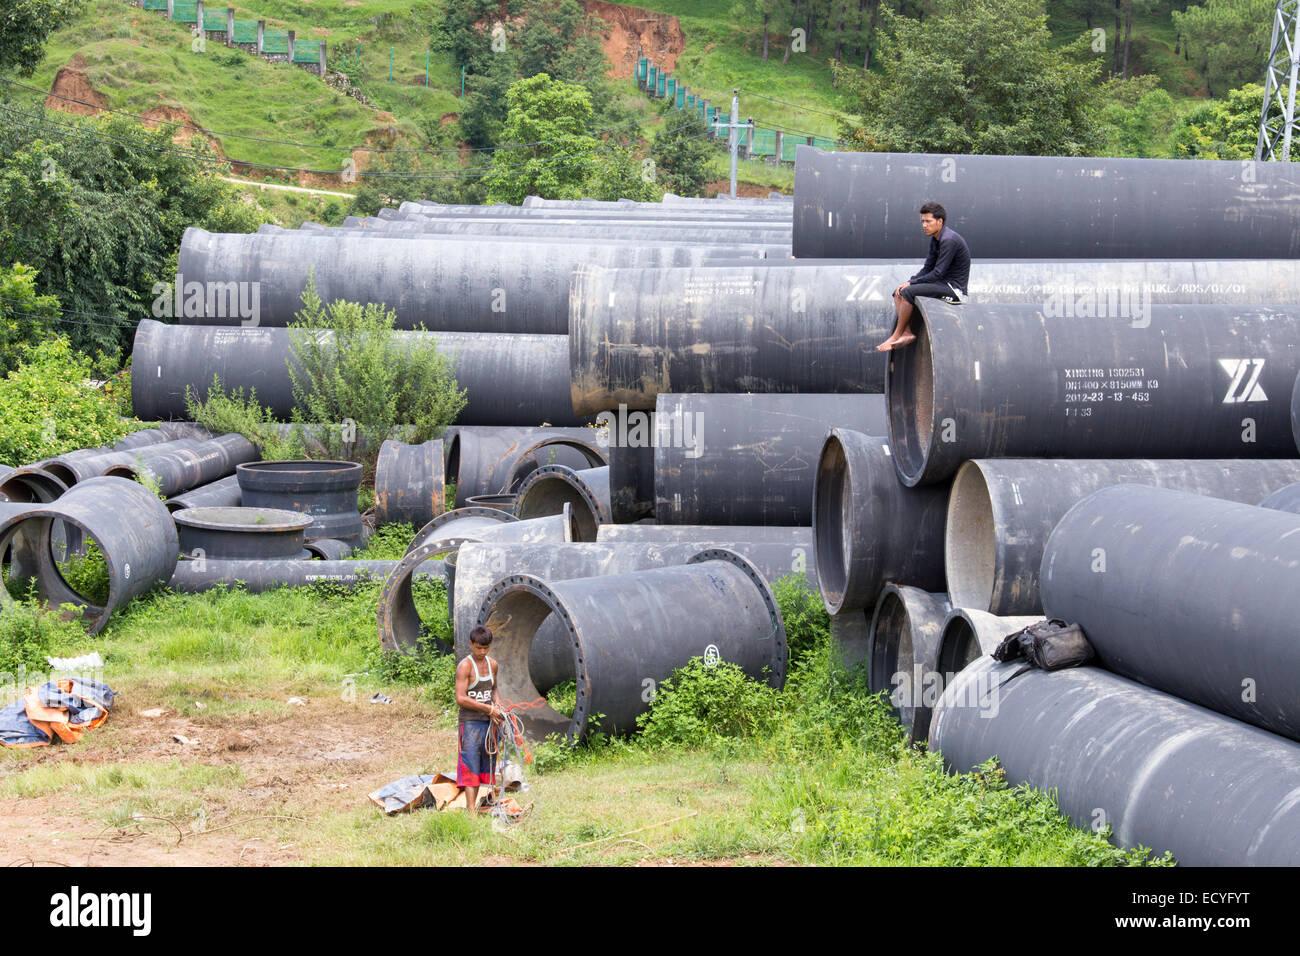 New pipeline to run water into Kathmandu Valley, Kathmandu, Nepal - Stock Image